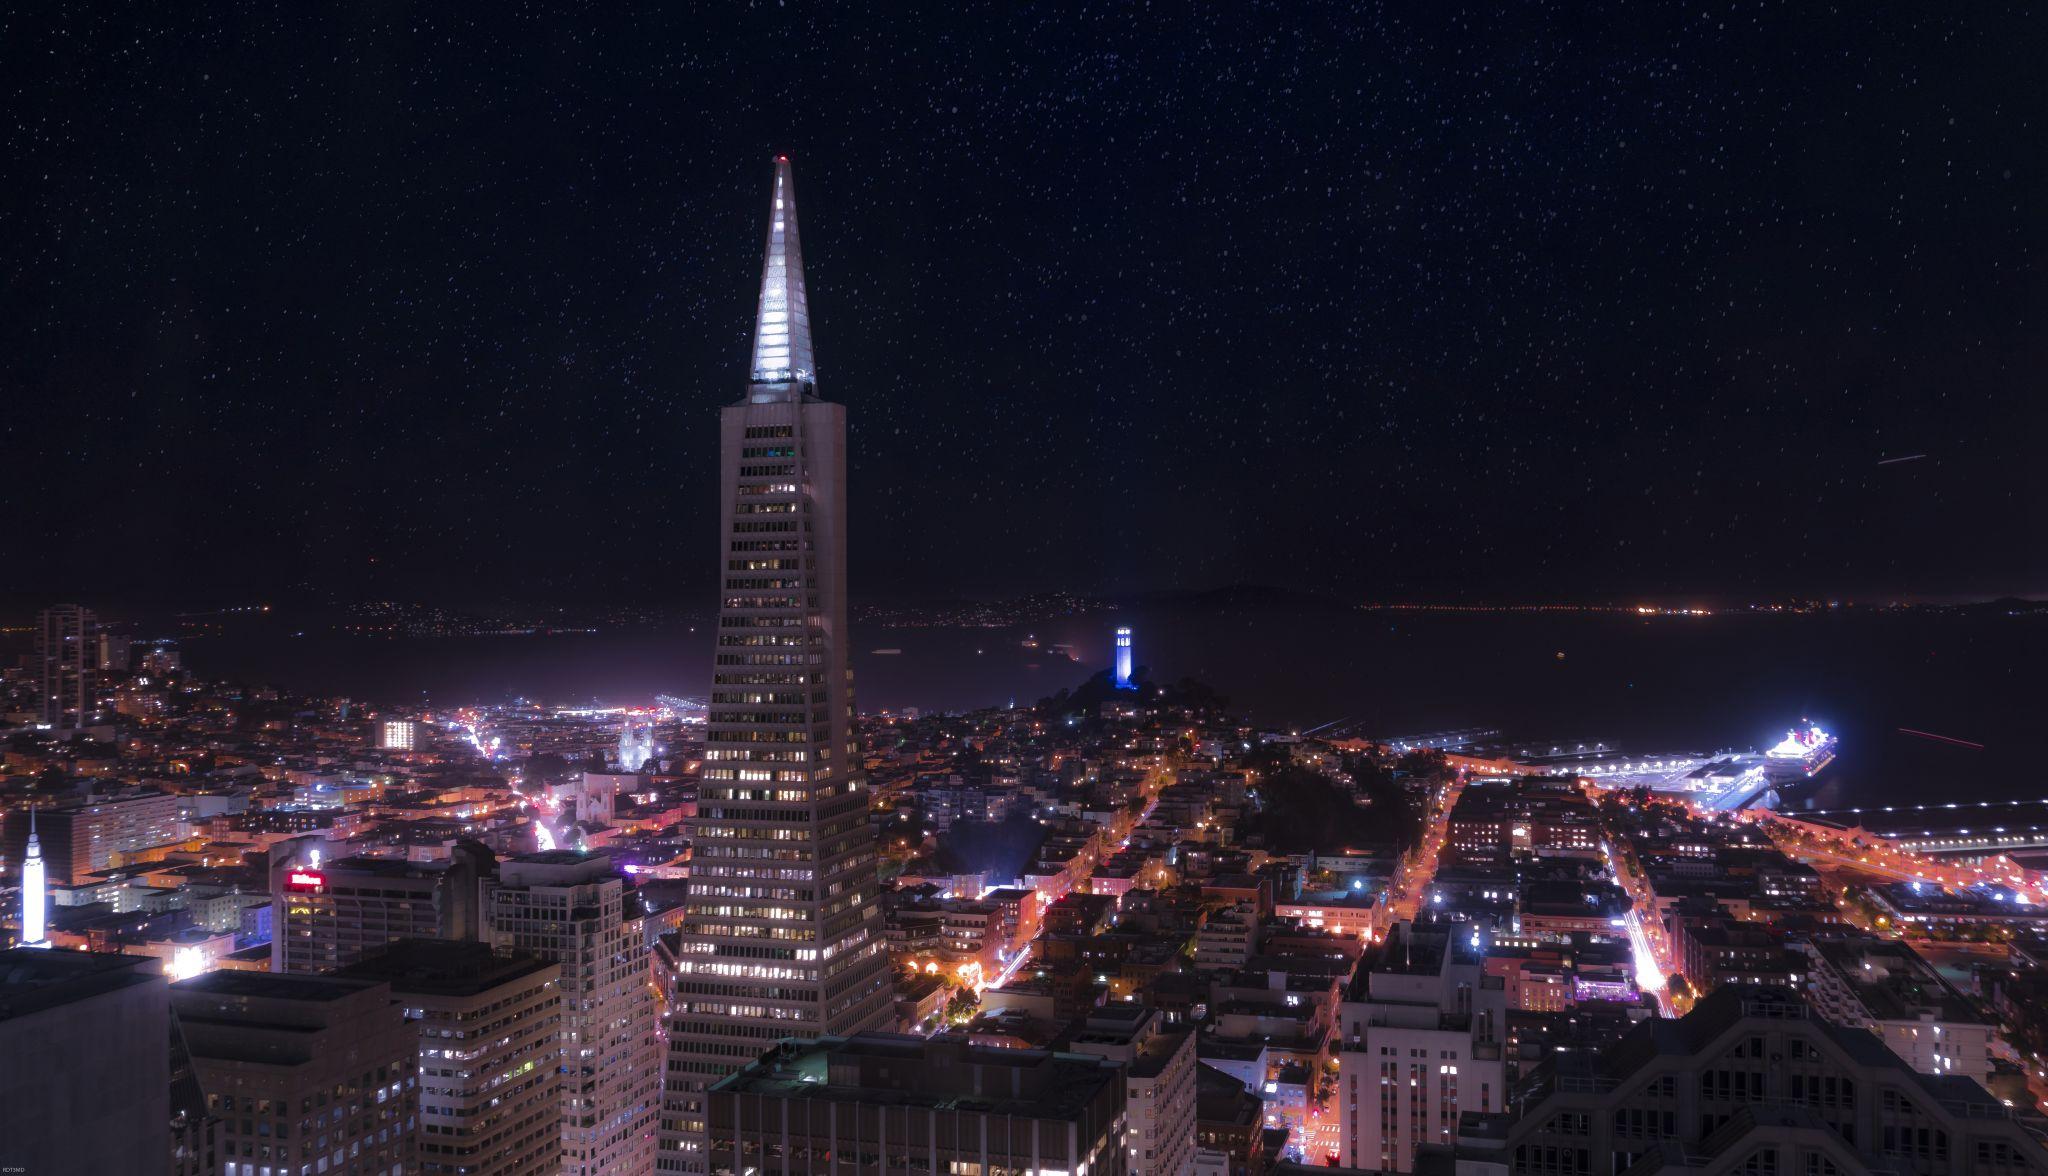 Transamerica from Loews Regency San Francisco, USA